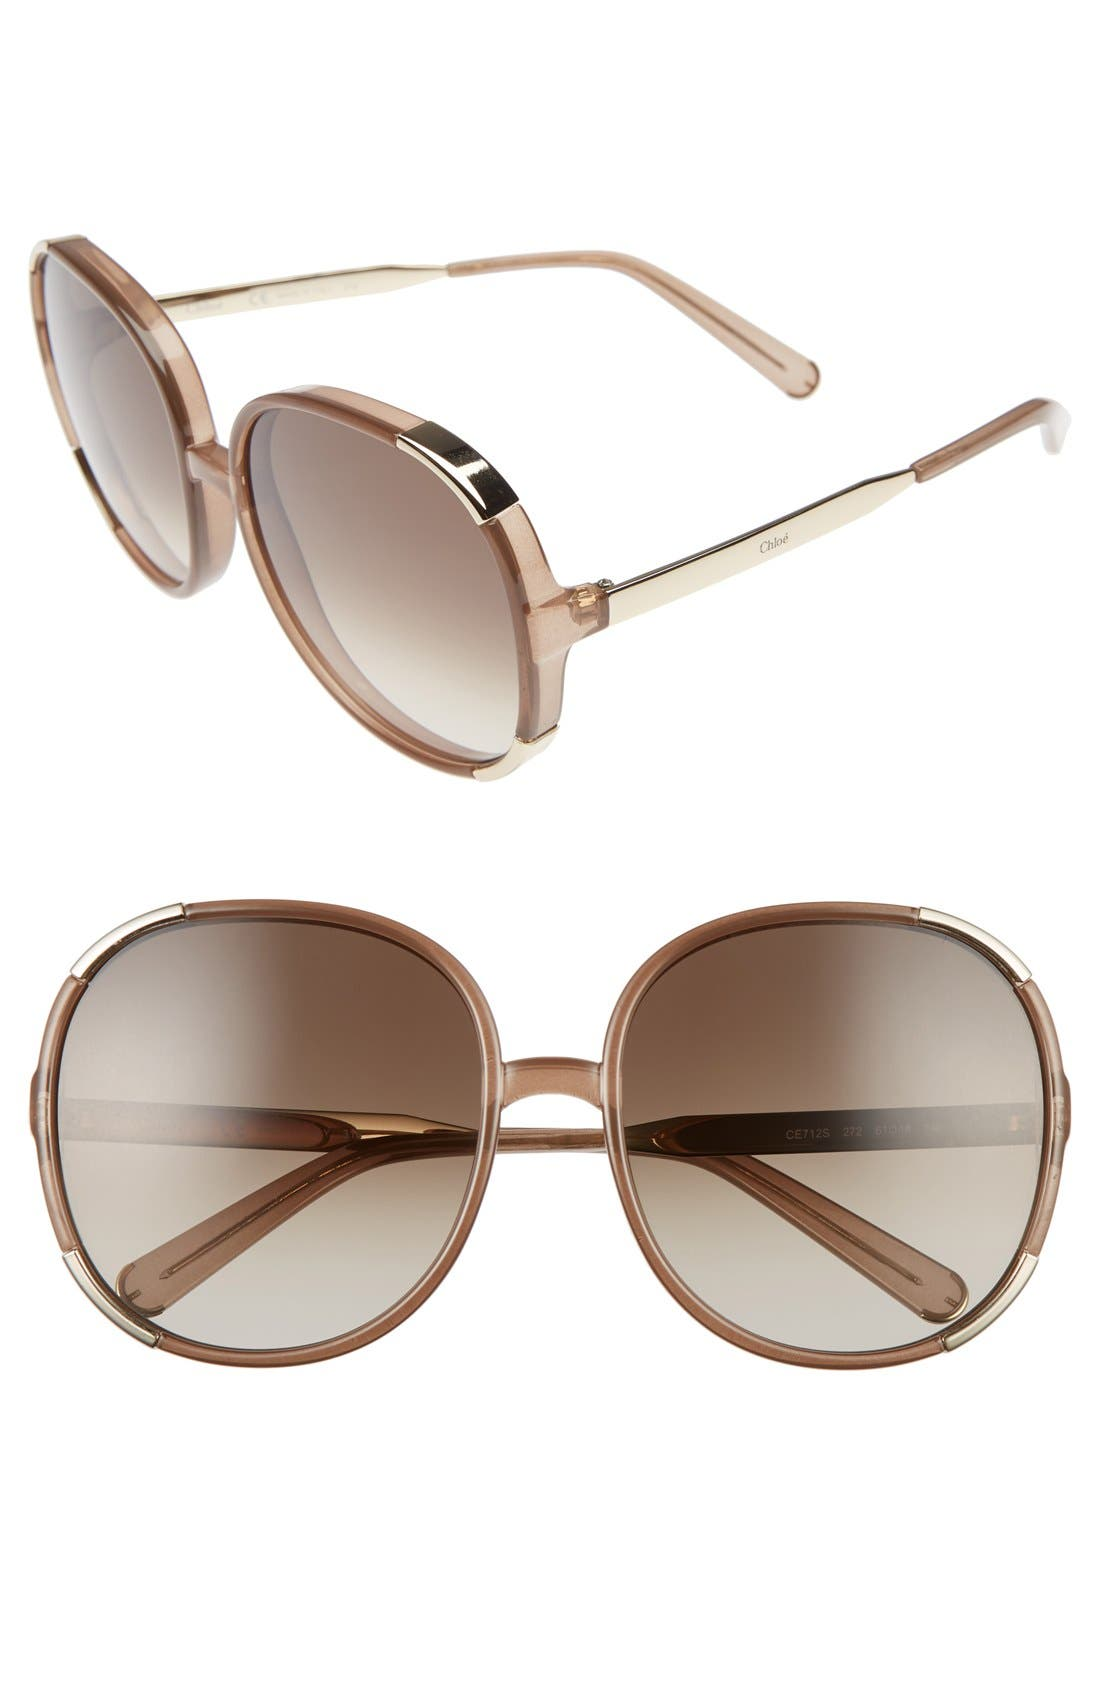 Sunglasses On Sale, Transparent Light Rose, 2017, one size Chloé